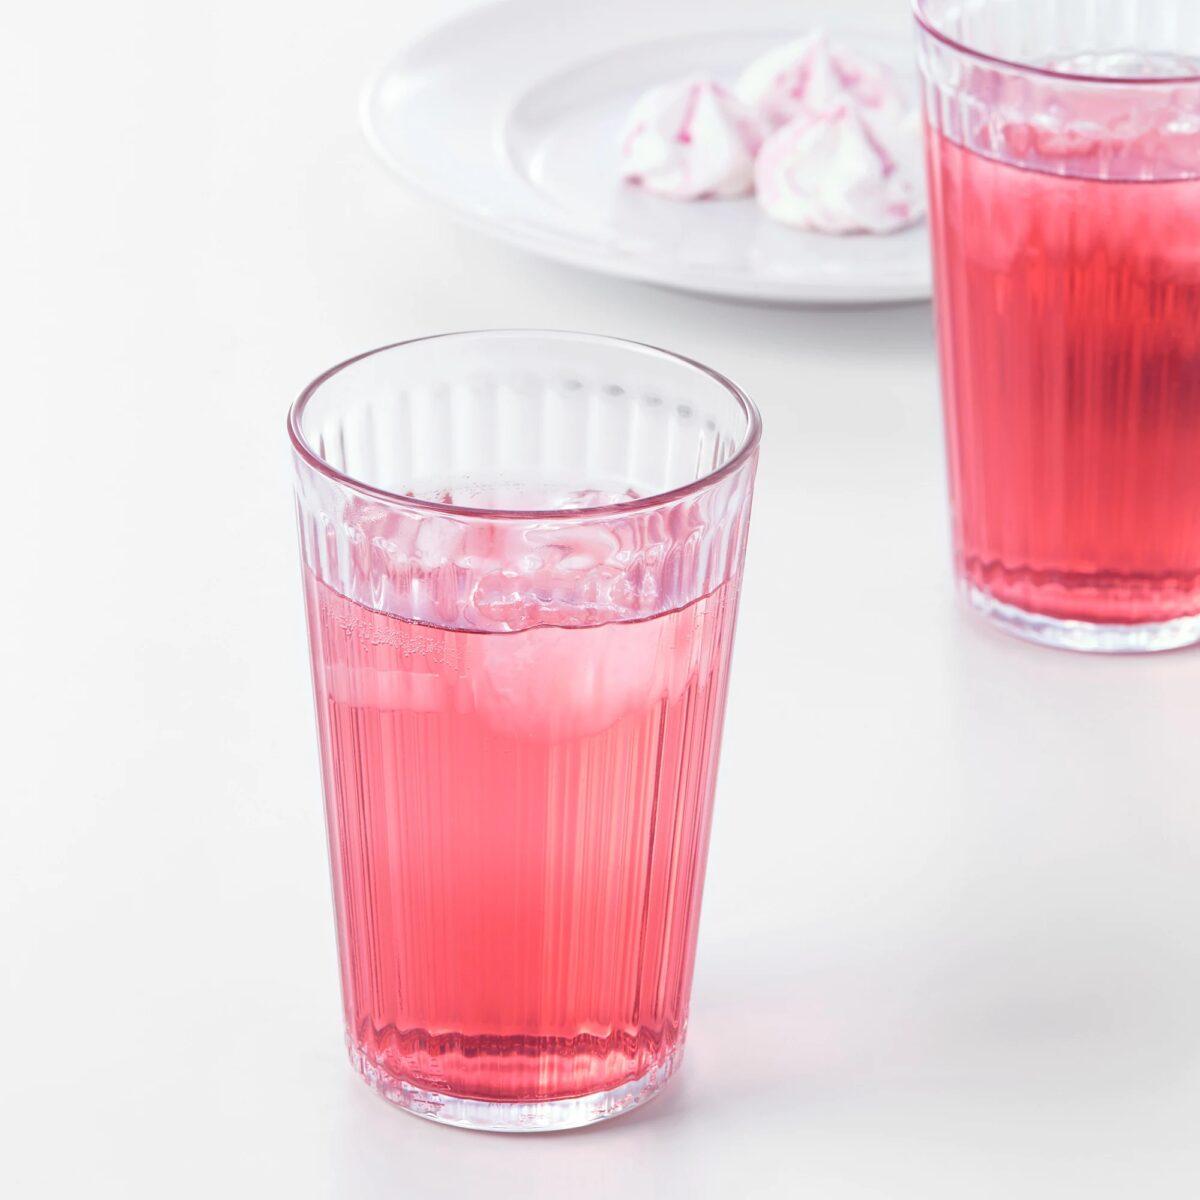 ikea-vardagen-bicchiere-vetro-trasparente